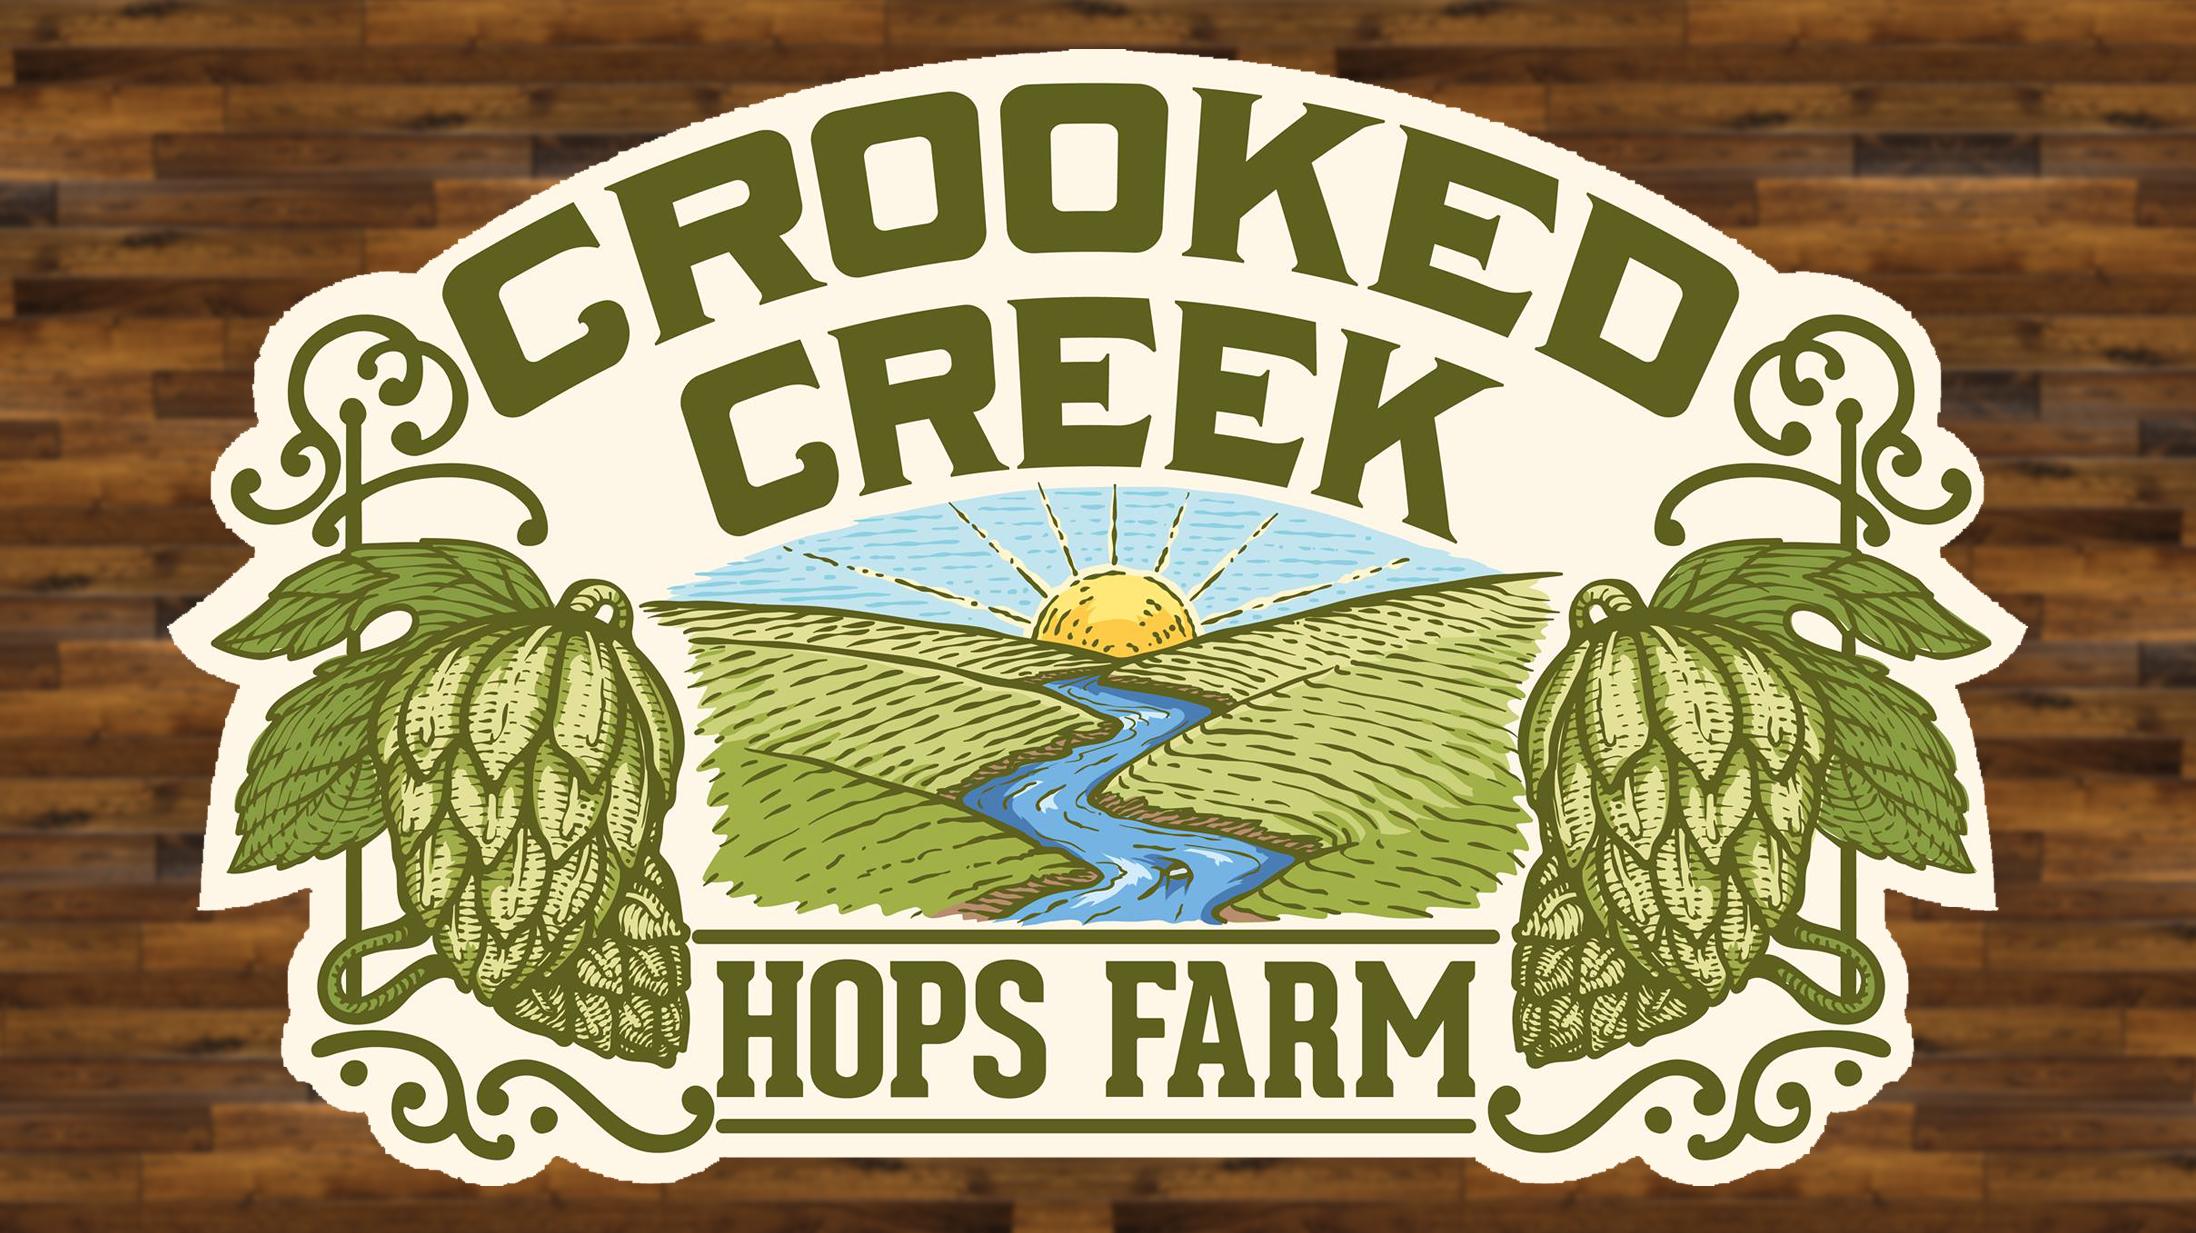 BREWERY OF BROKEN DREAMS Hammondsport New York STICKER decal craft beer brewing